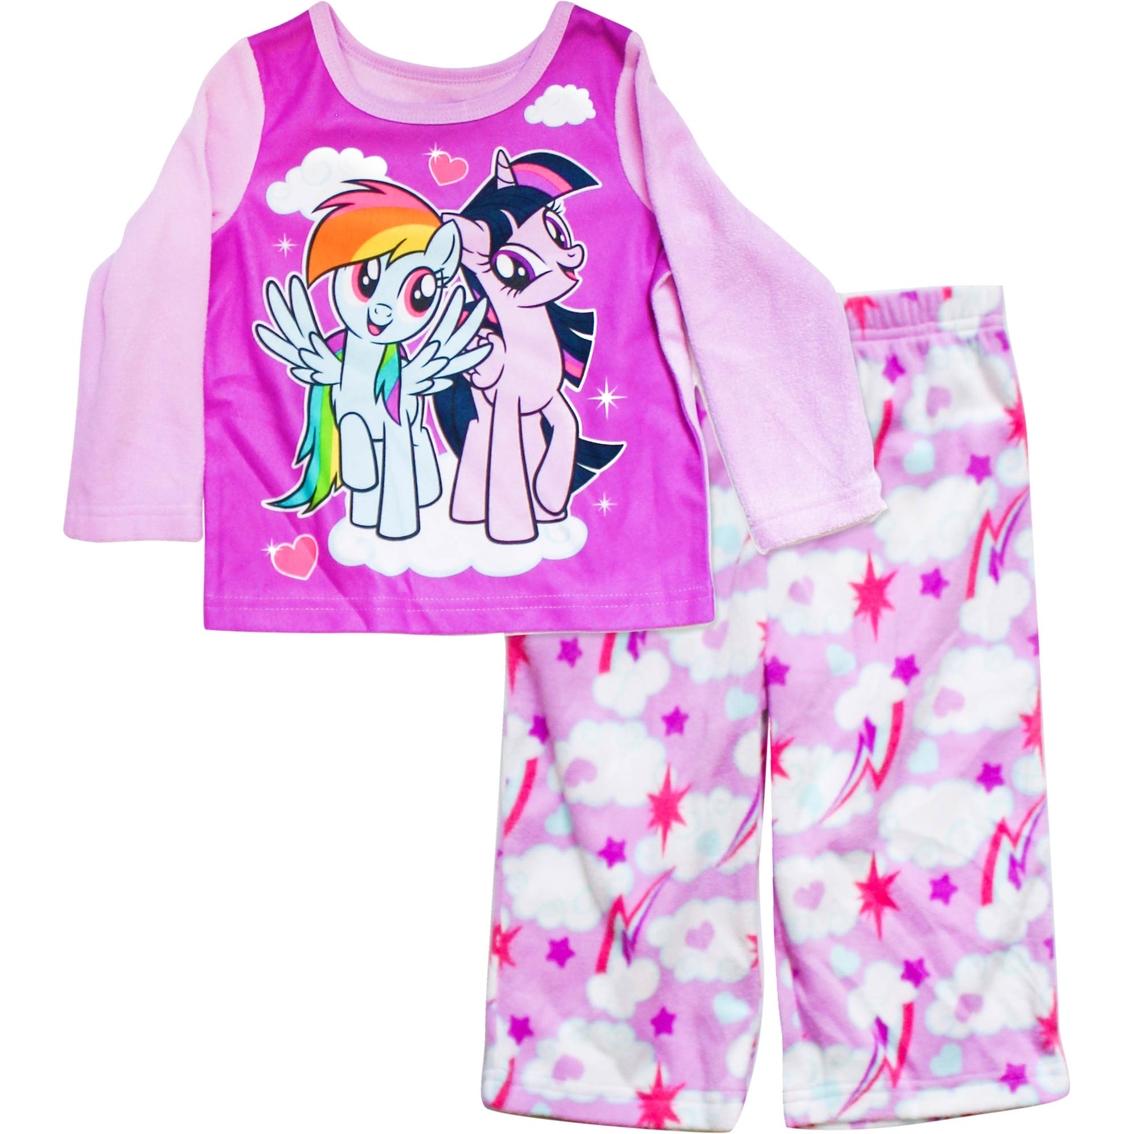 97175a7b3ed1 My Little Pony Infant Girls Perfect Friends 2 Pc. Pajama Set